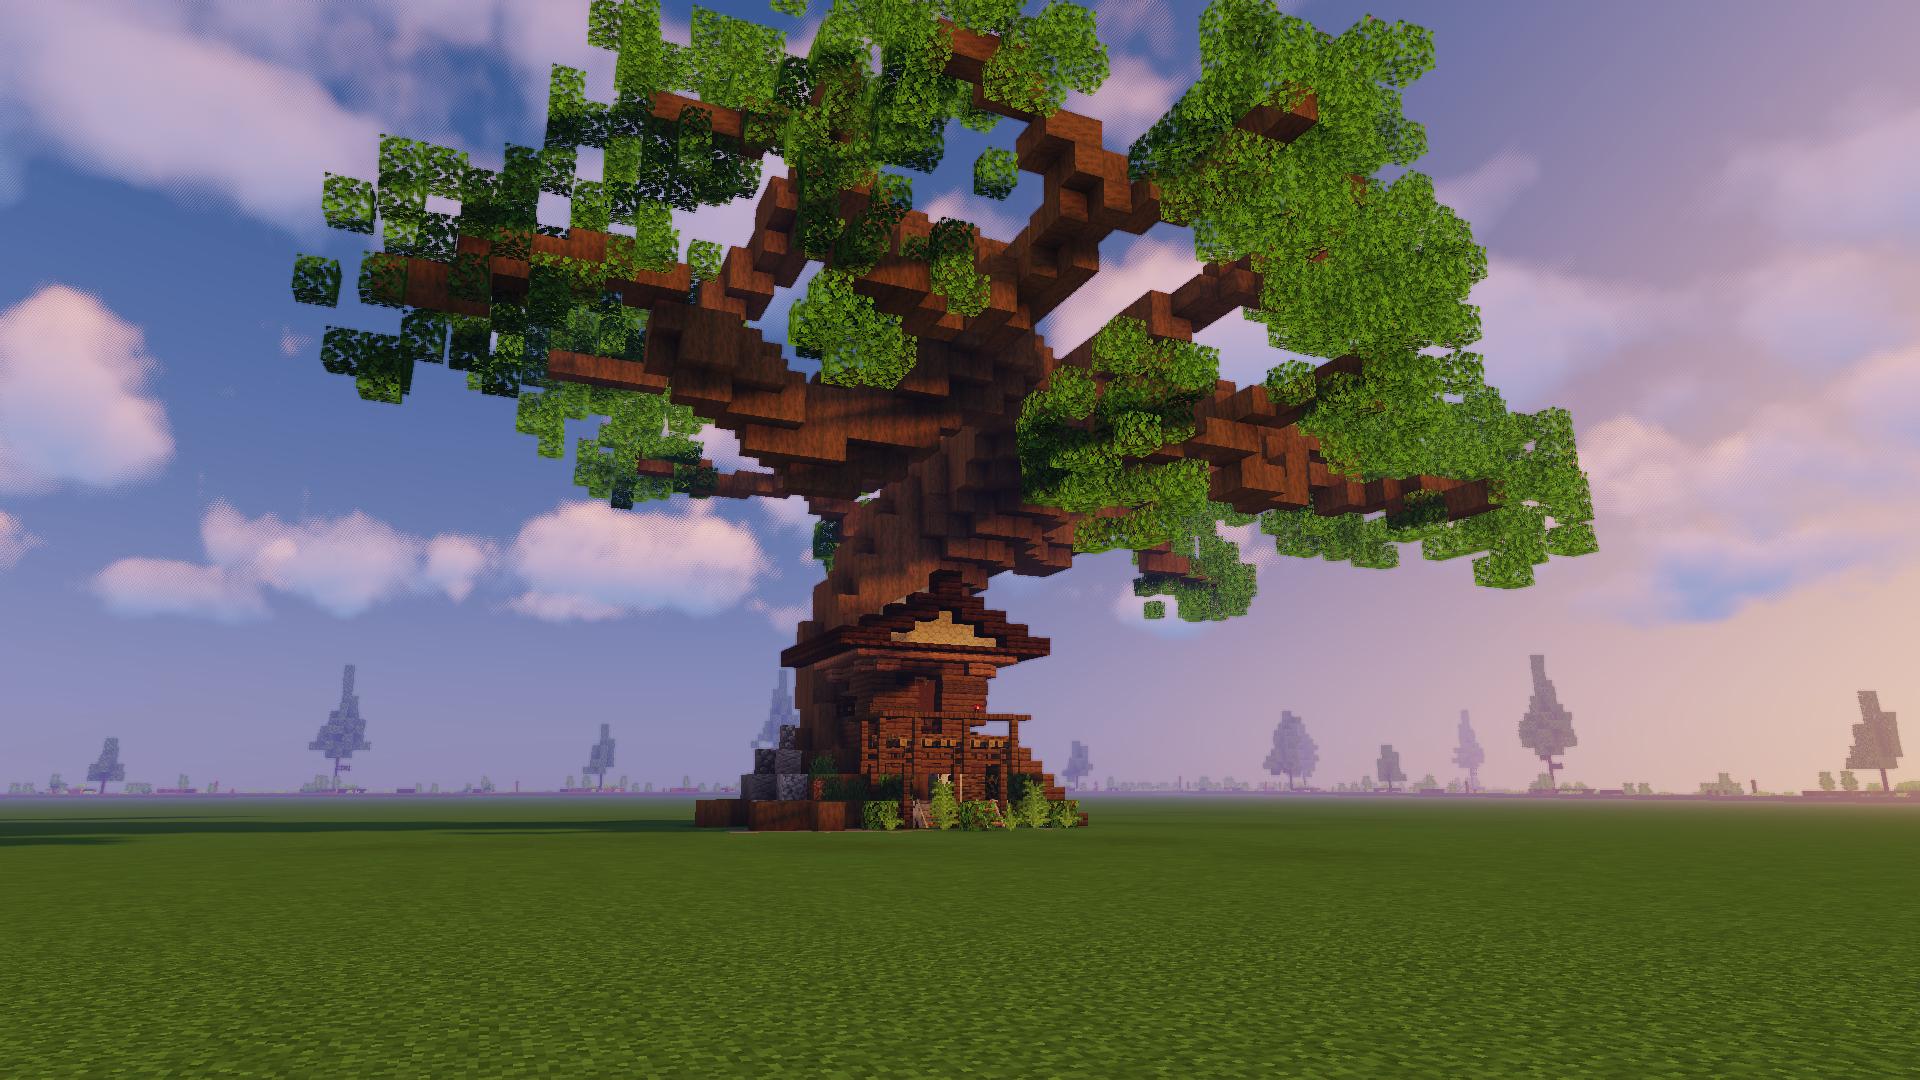 Treehouse Download Schematic Minecraft Tree Minecraft Treehouses Minecraft Creations